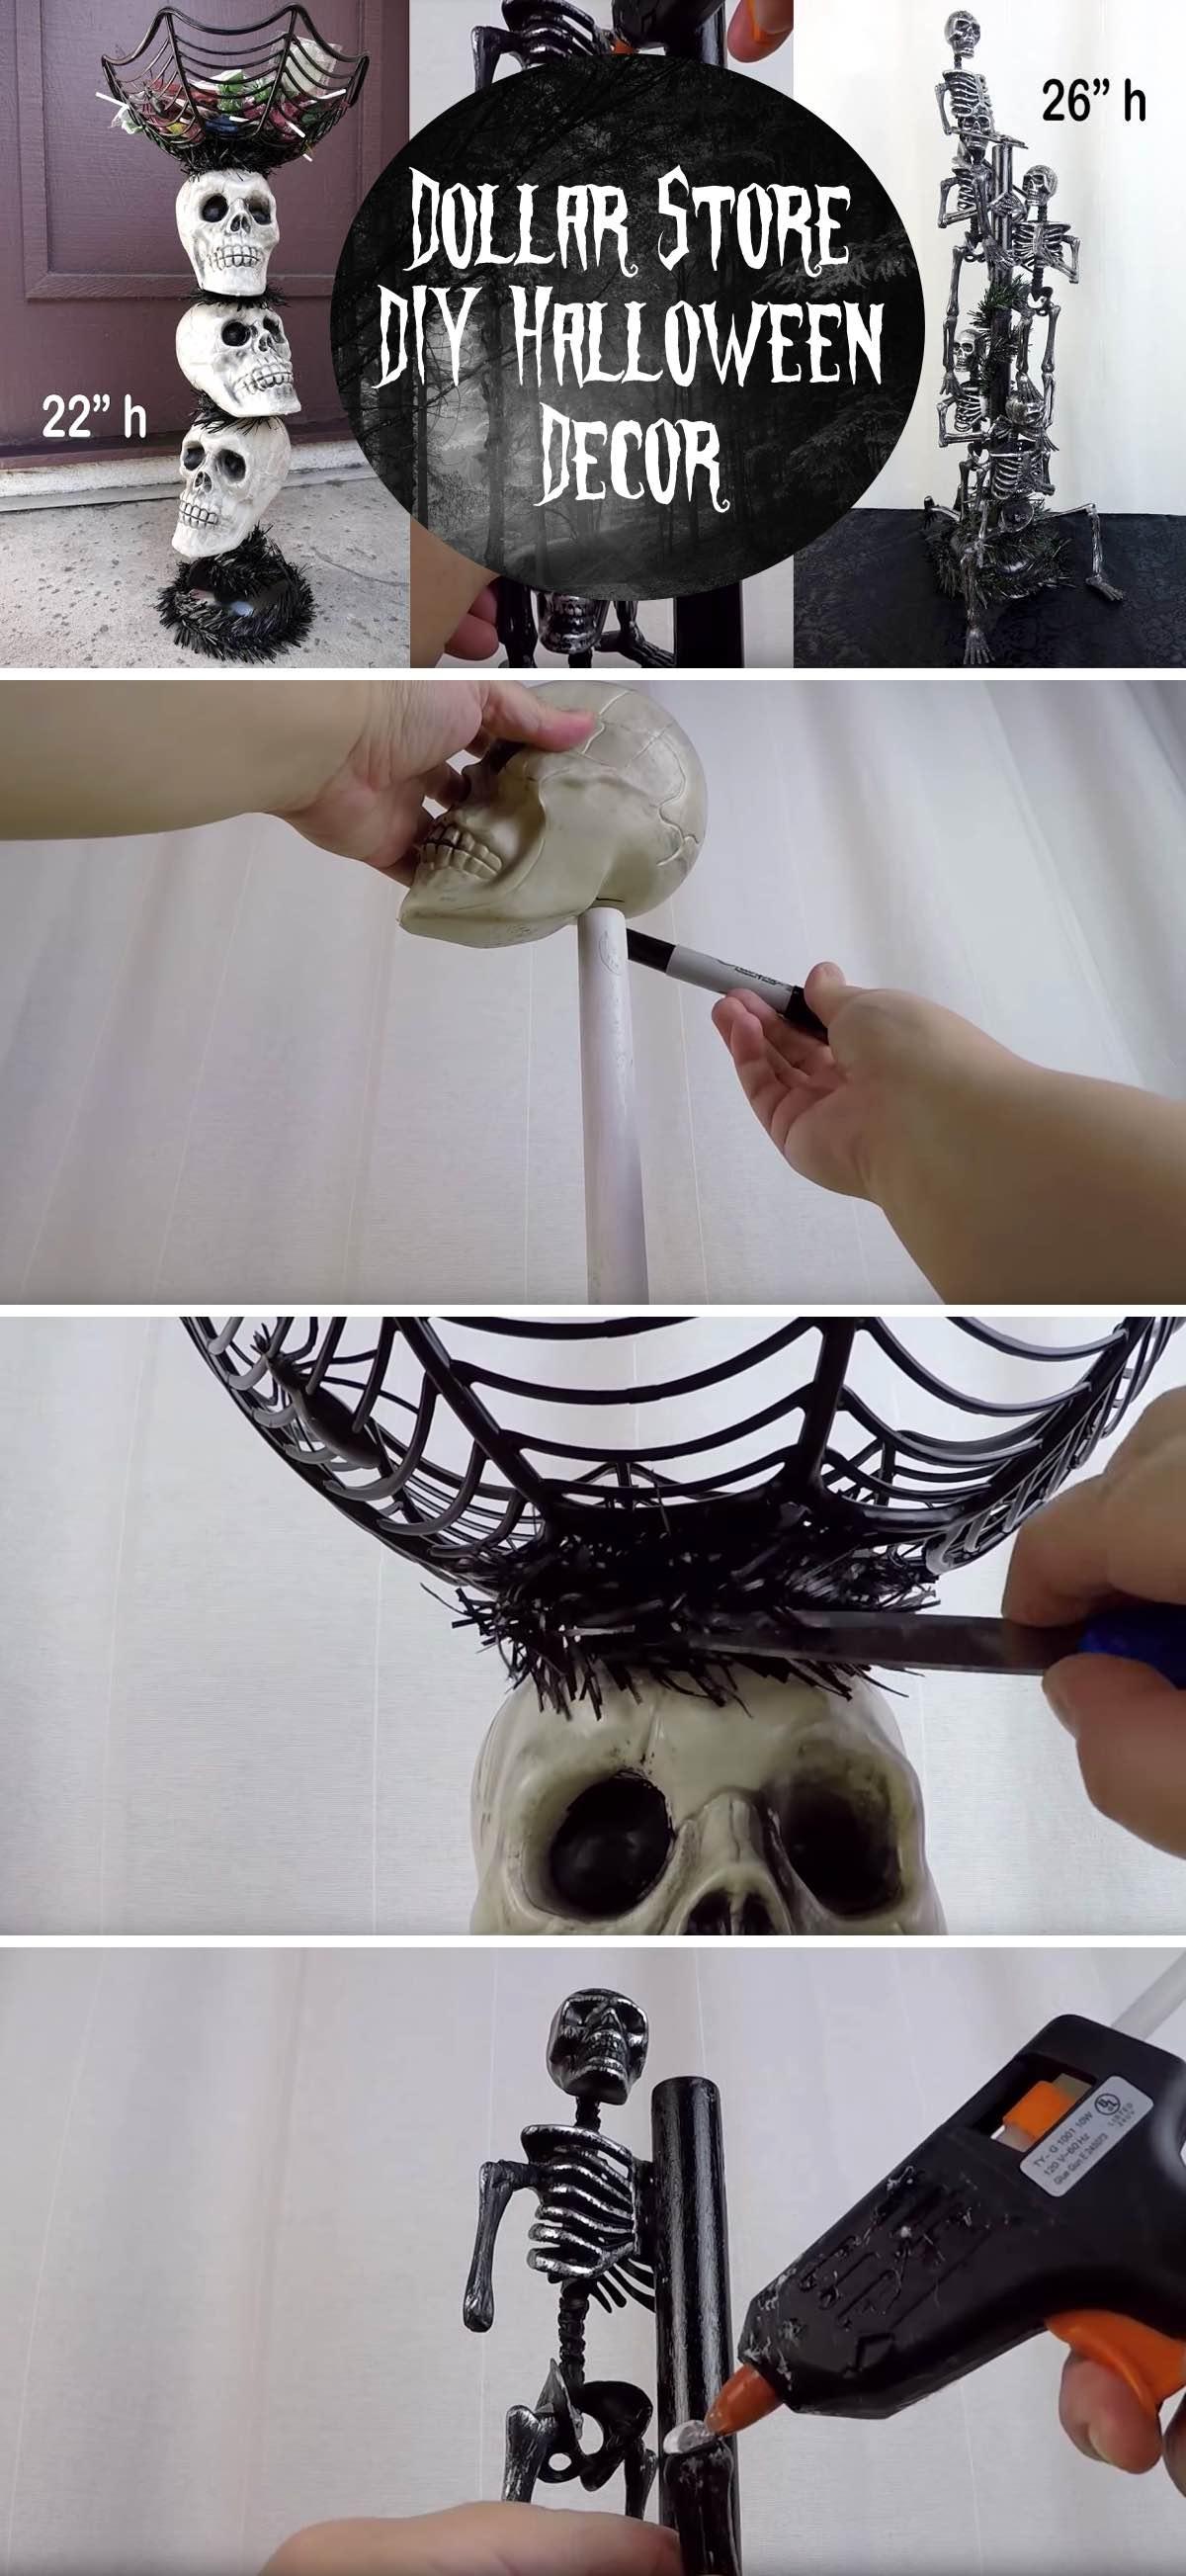 Dollar Store DIY Halloween Decor - Skull Candy Stand